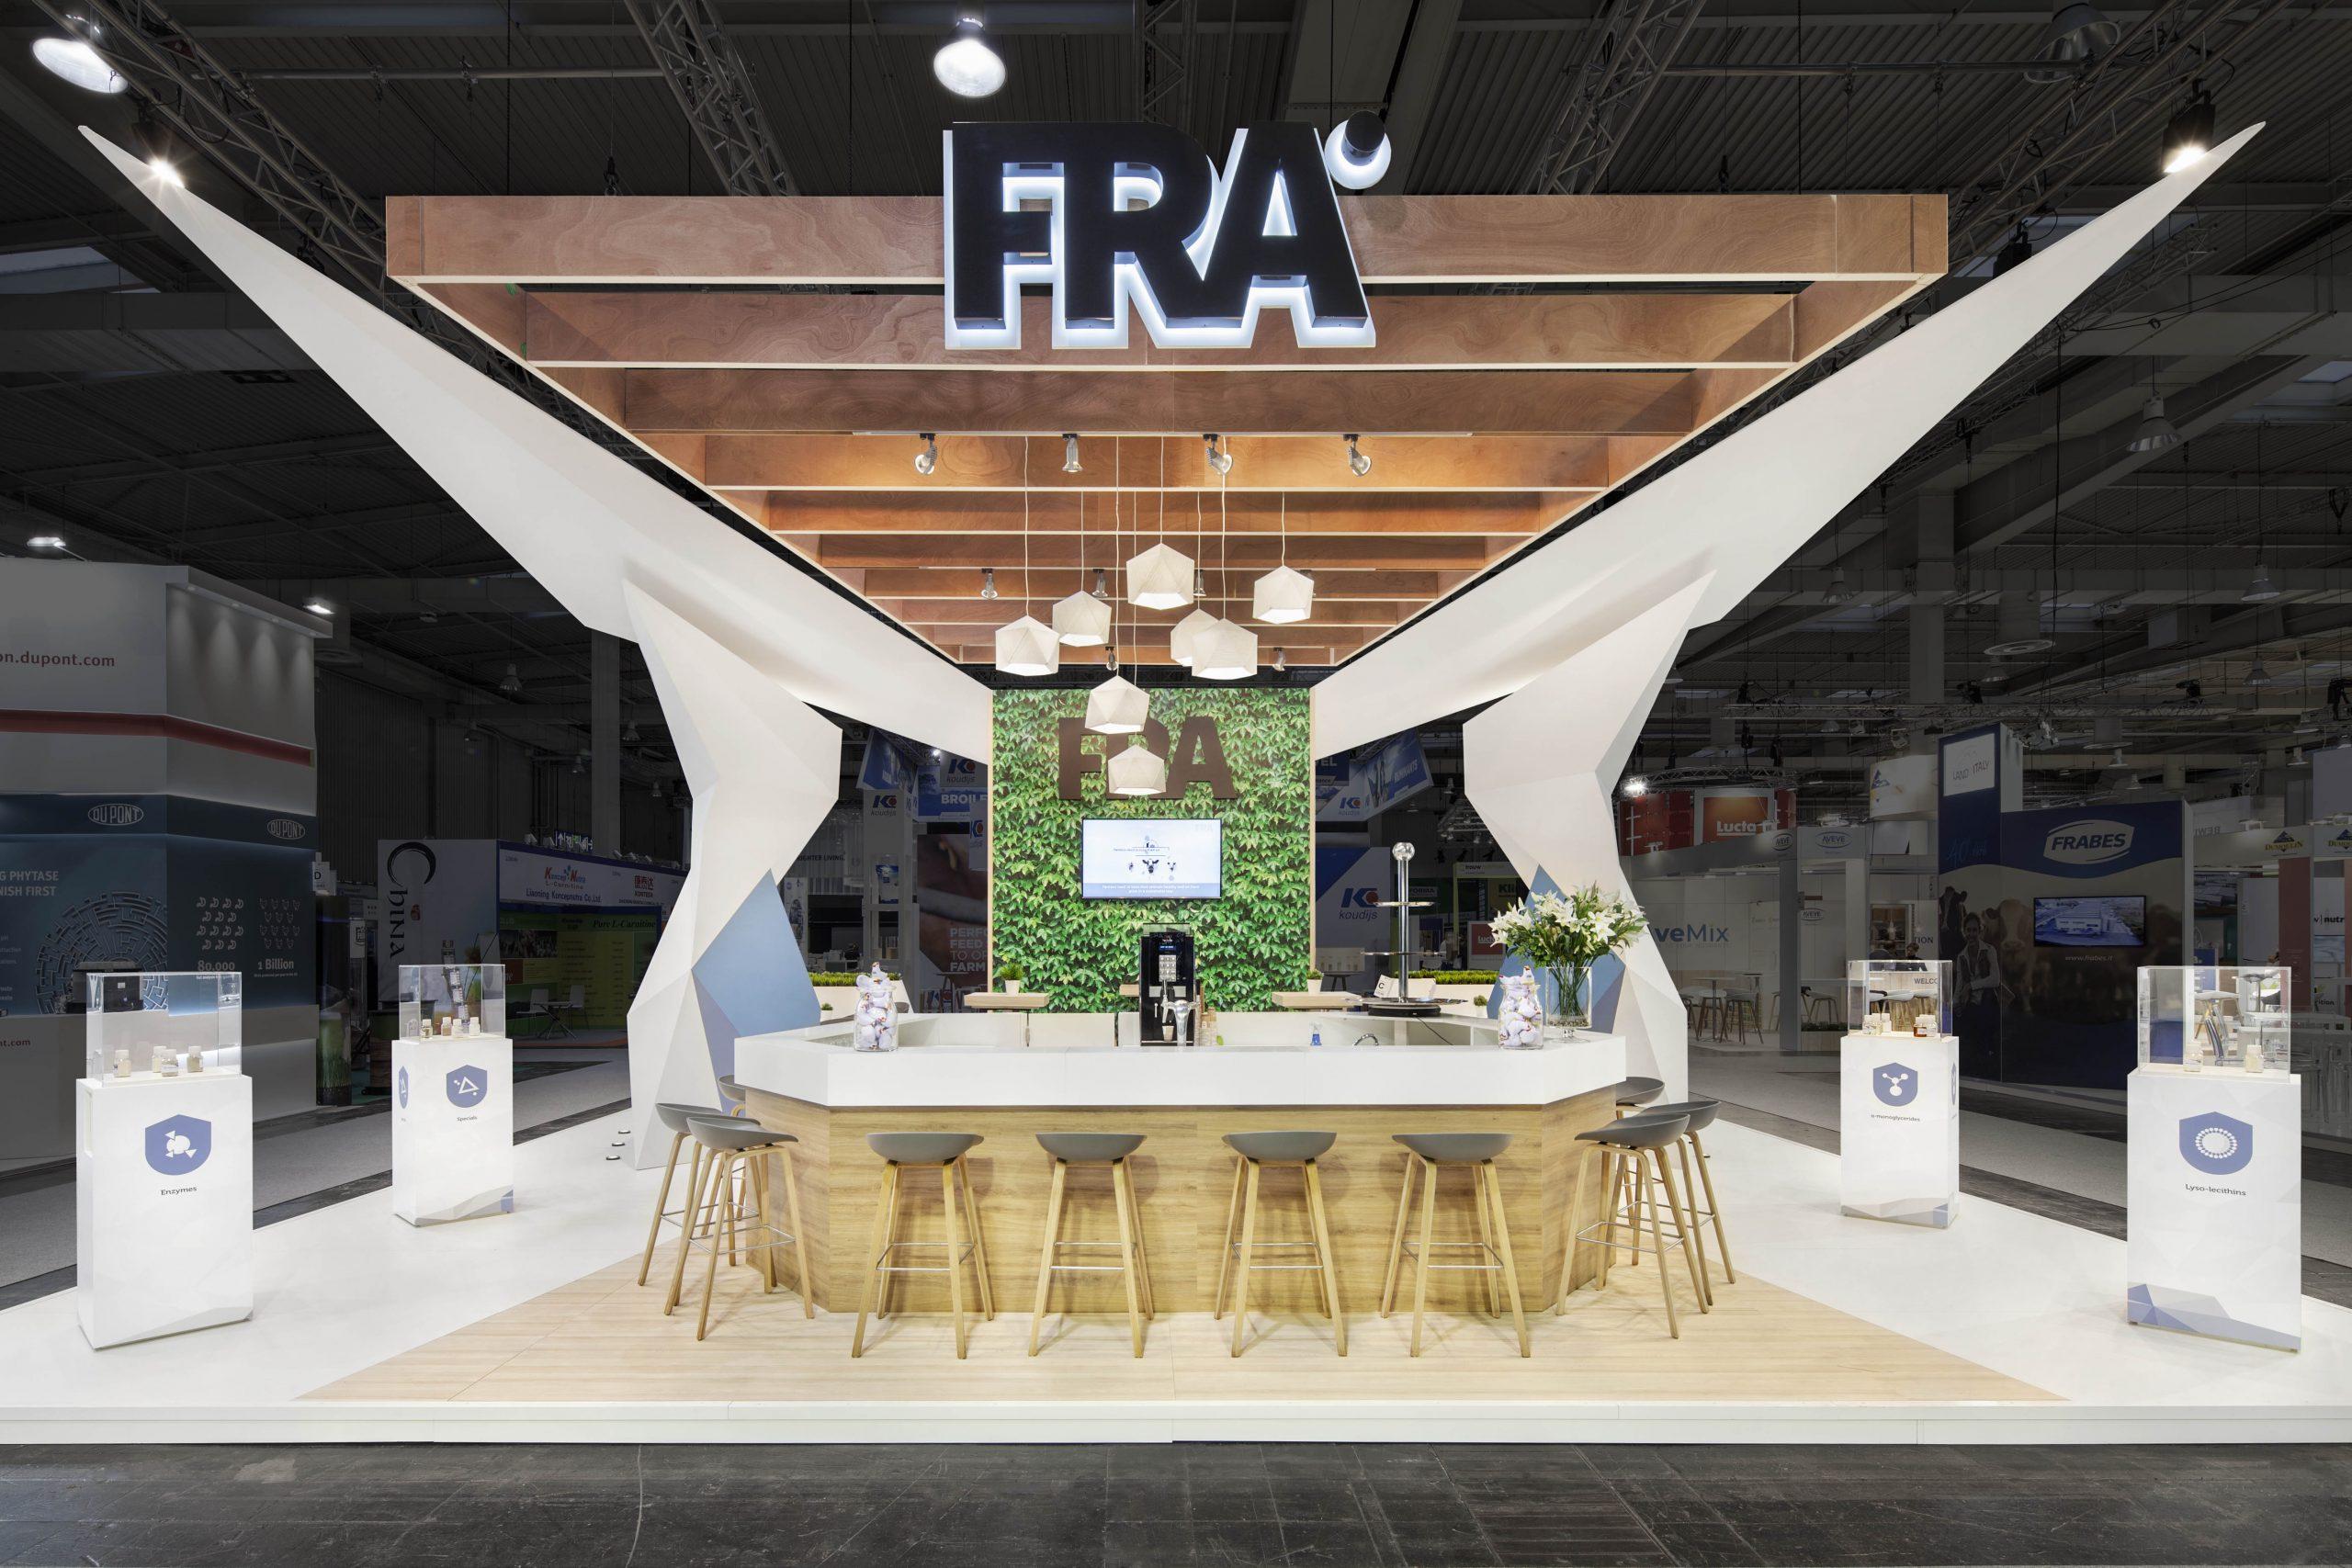 The Inside - Framelco - Eurotier 2018 - Hannover - Standbouwfotografie #1558(lr)